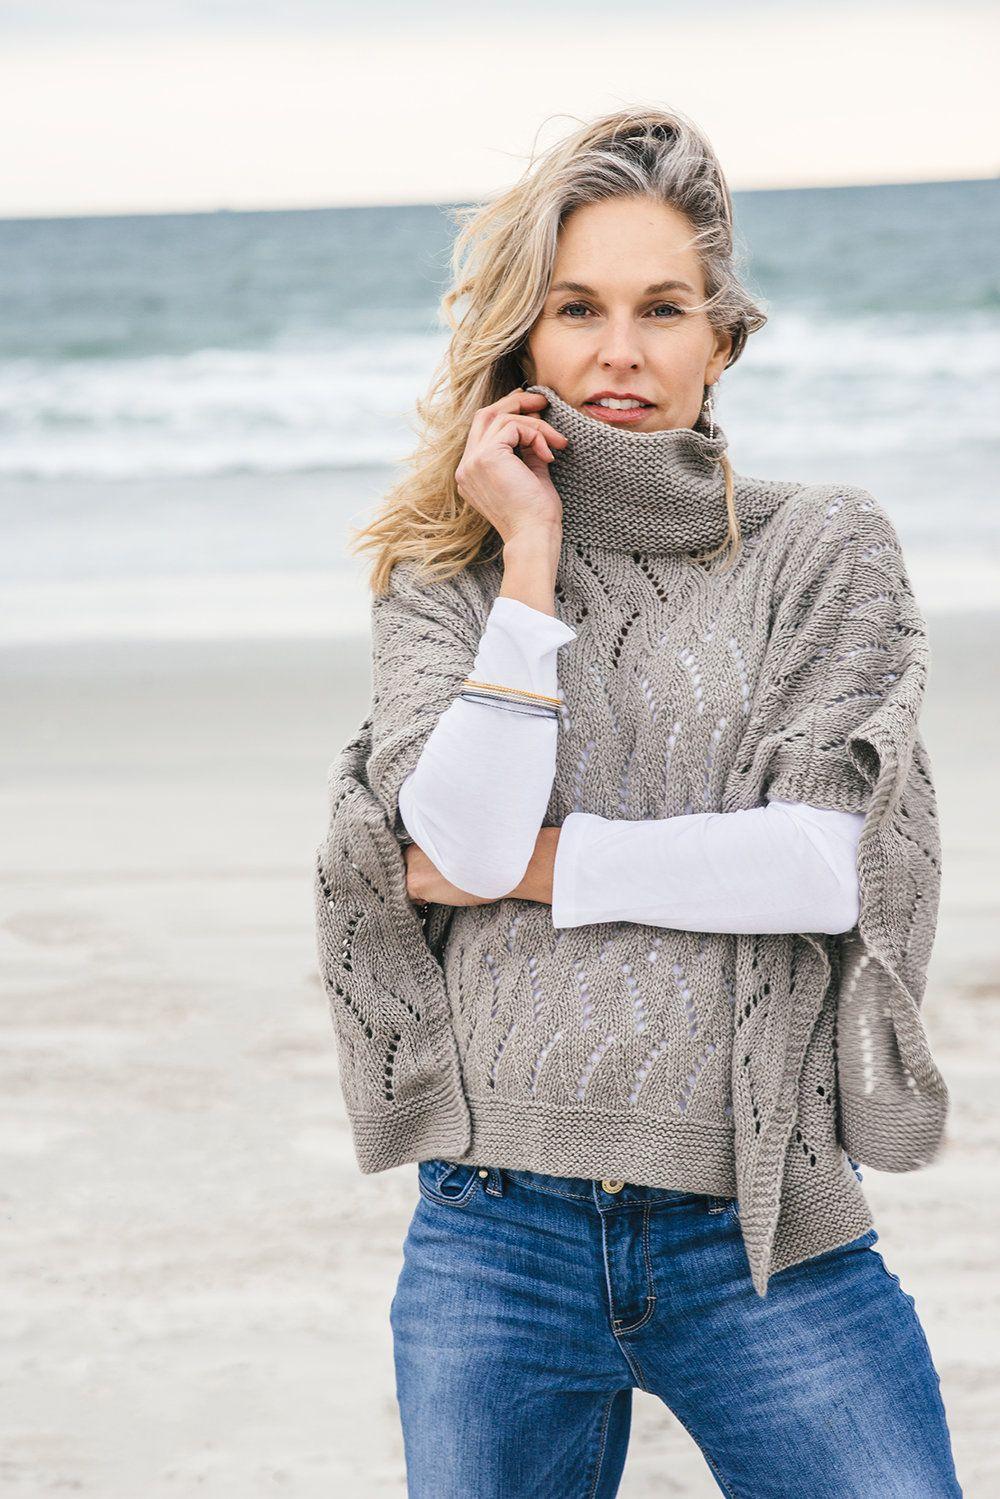 Introducing: The Luma Collection   Knitting & crochet   Pinterest ...